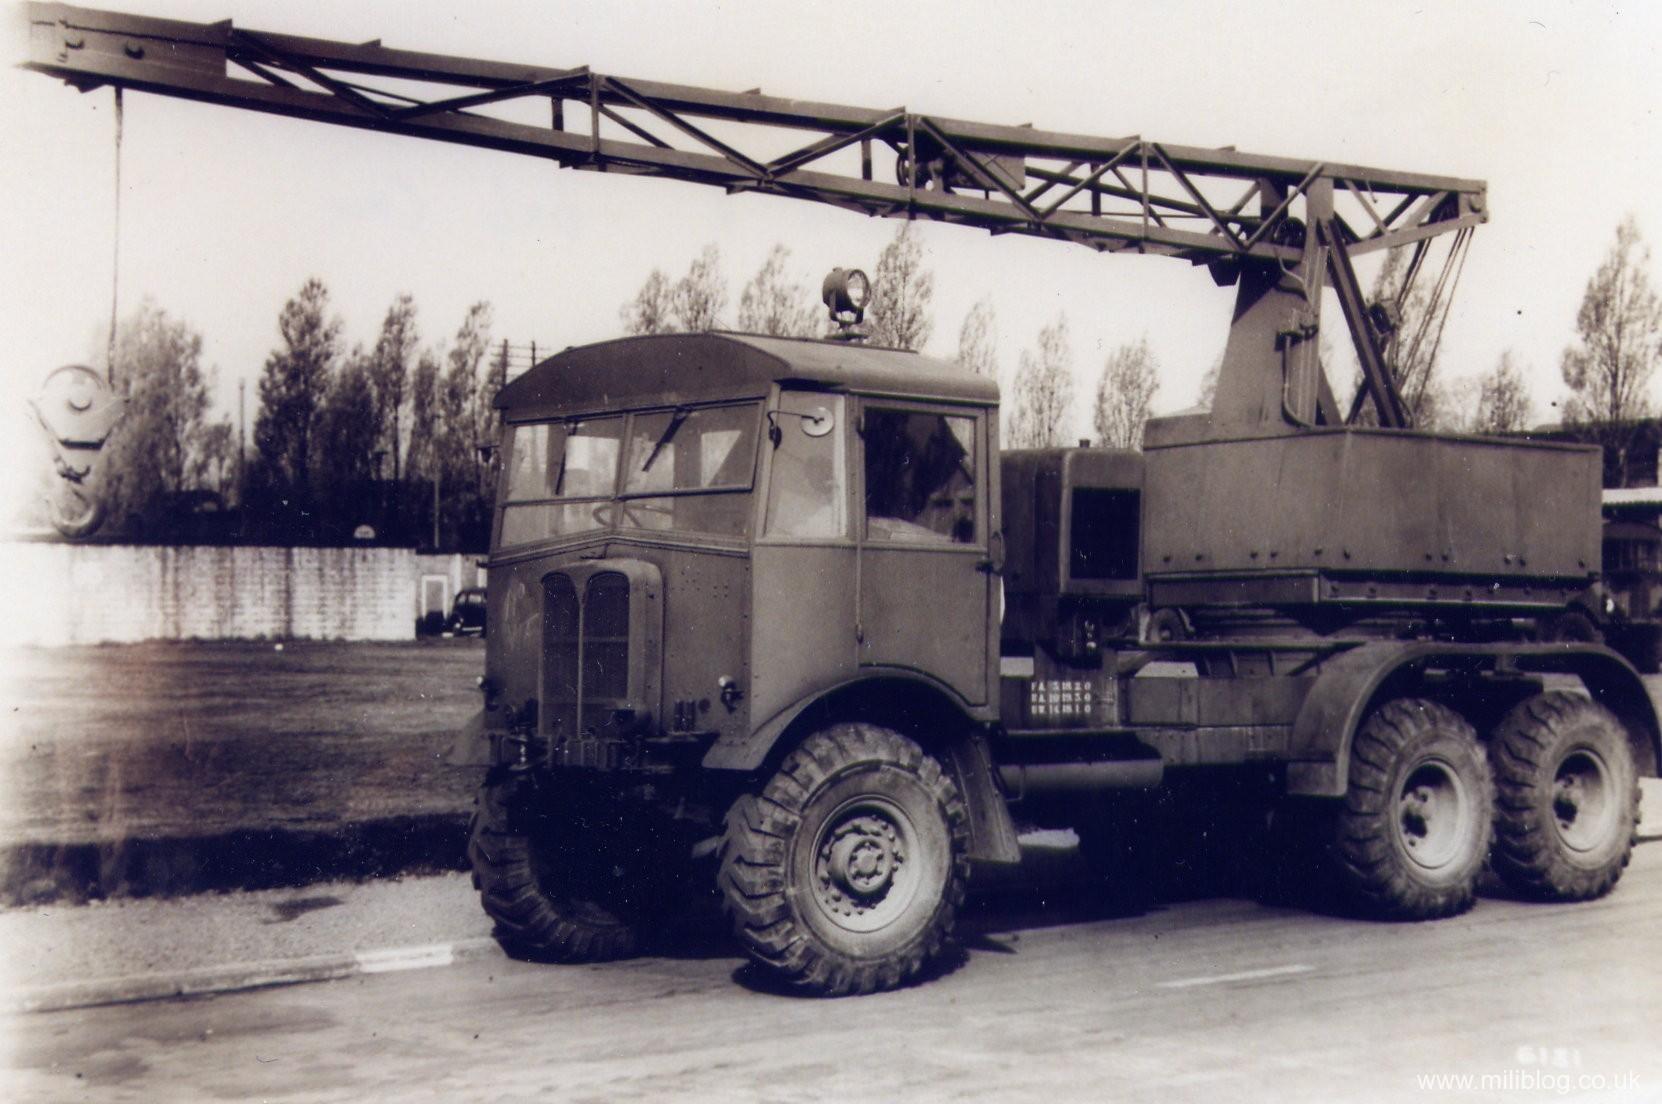 Military items | Military vehicles | Military trucks